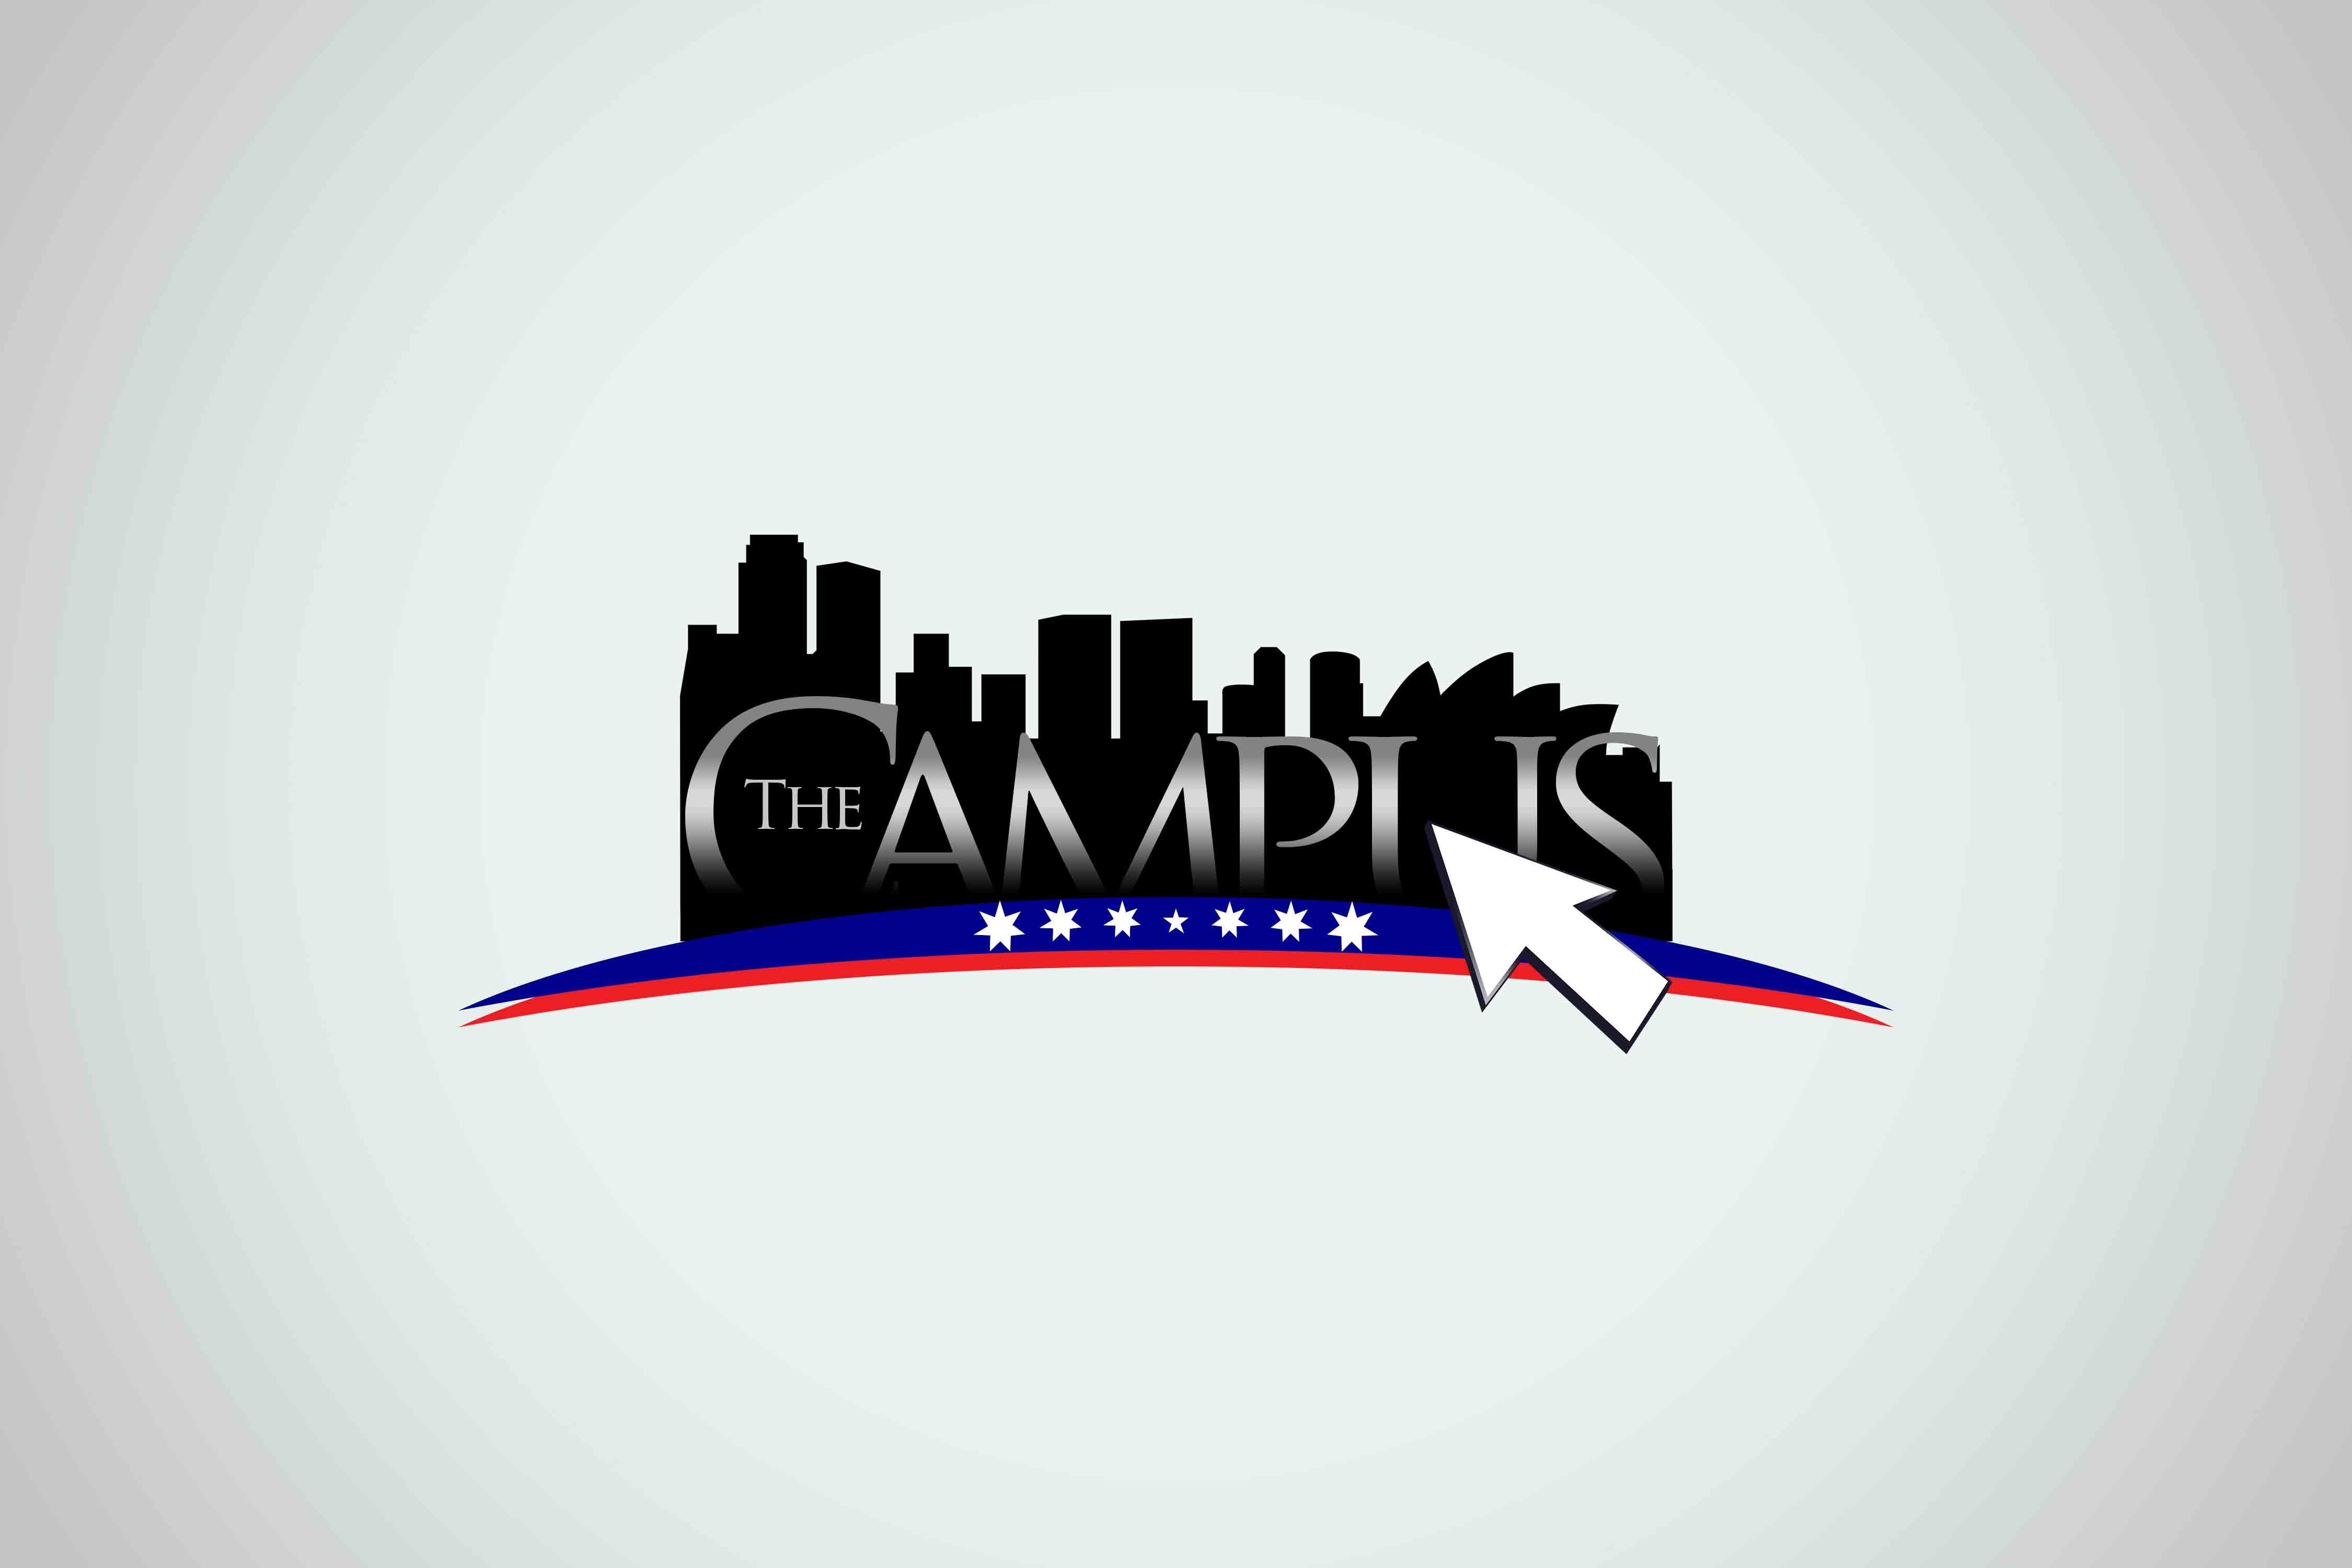 Logo Design by Ruzzel Zamora - Entry No. 8 in the Logo Design Contest theCampus Logo Design.